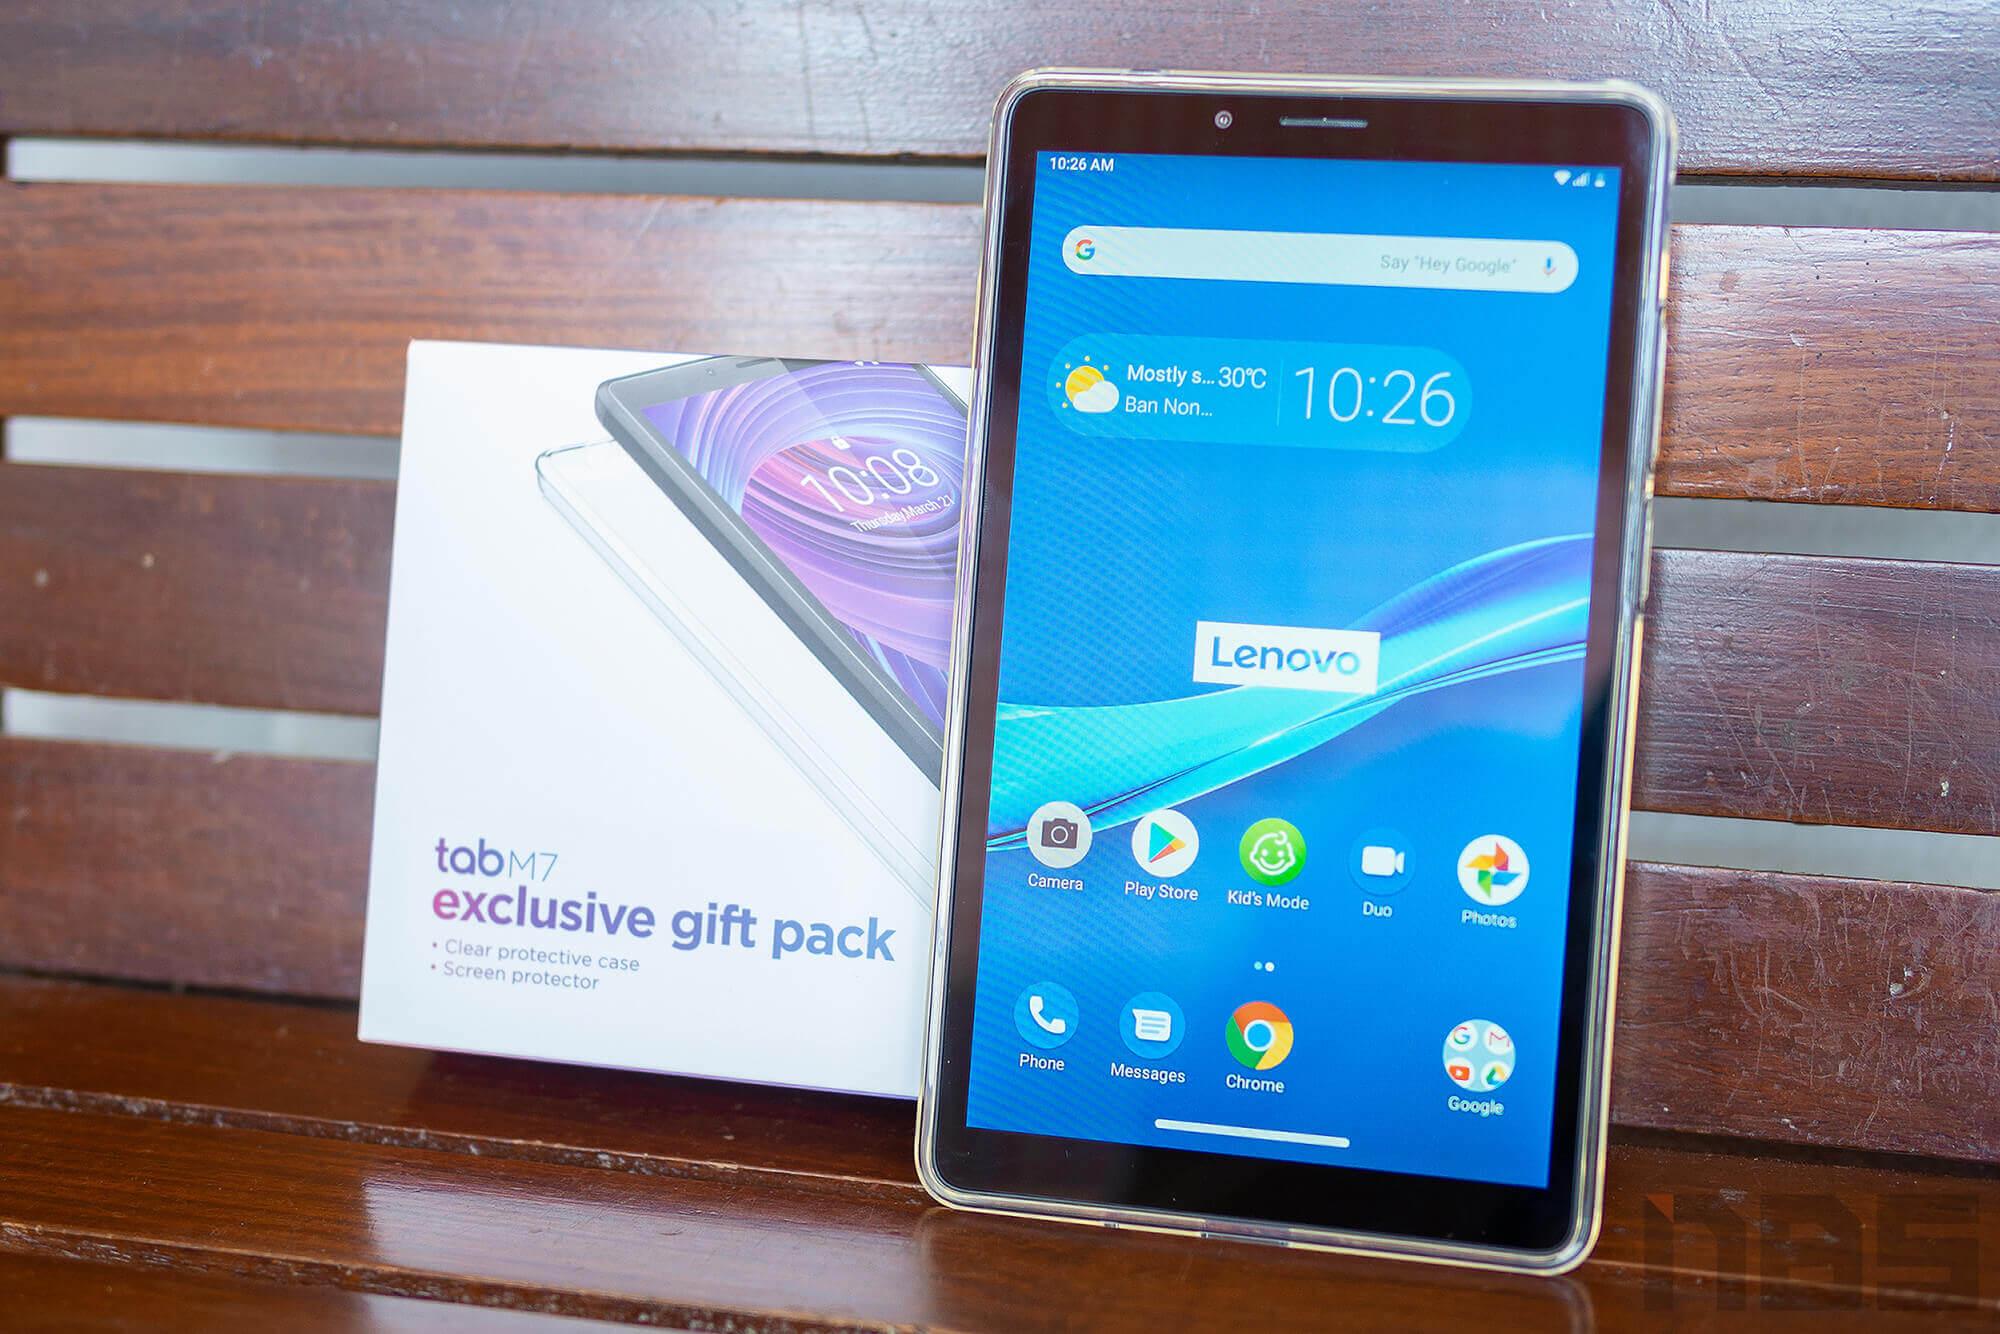 Review Lenovo Tab M7 NotebookSPEC 25